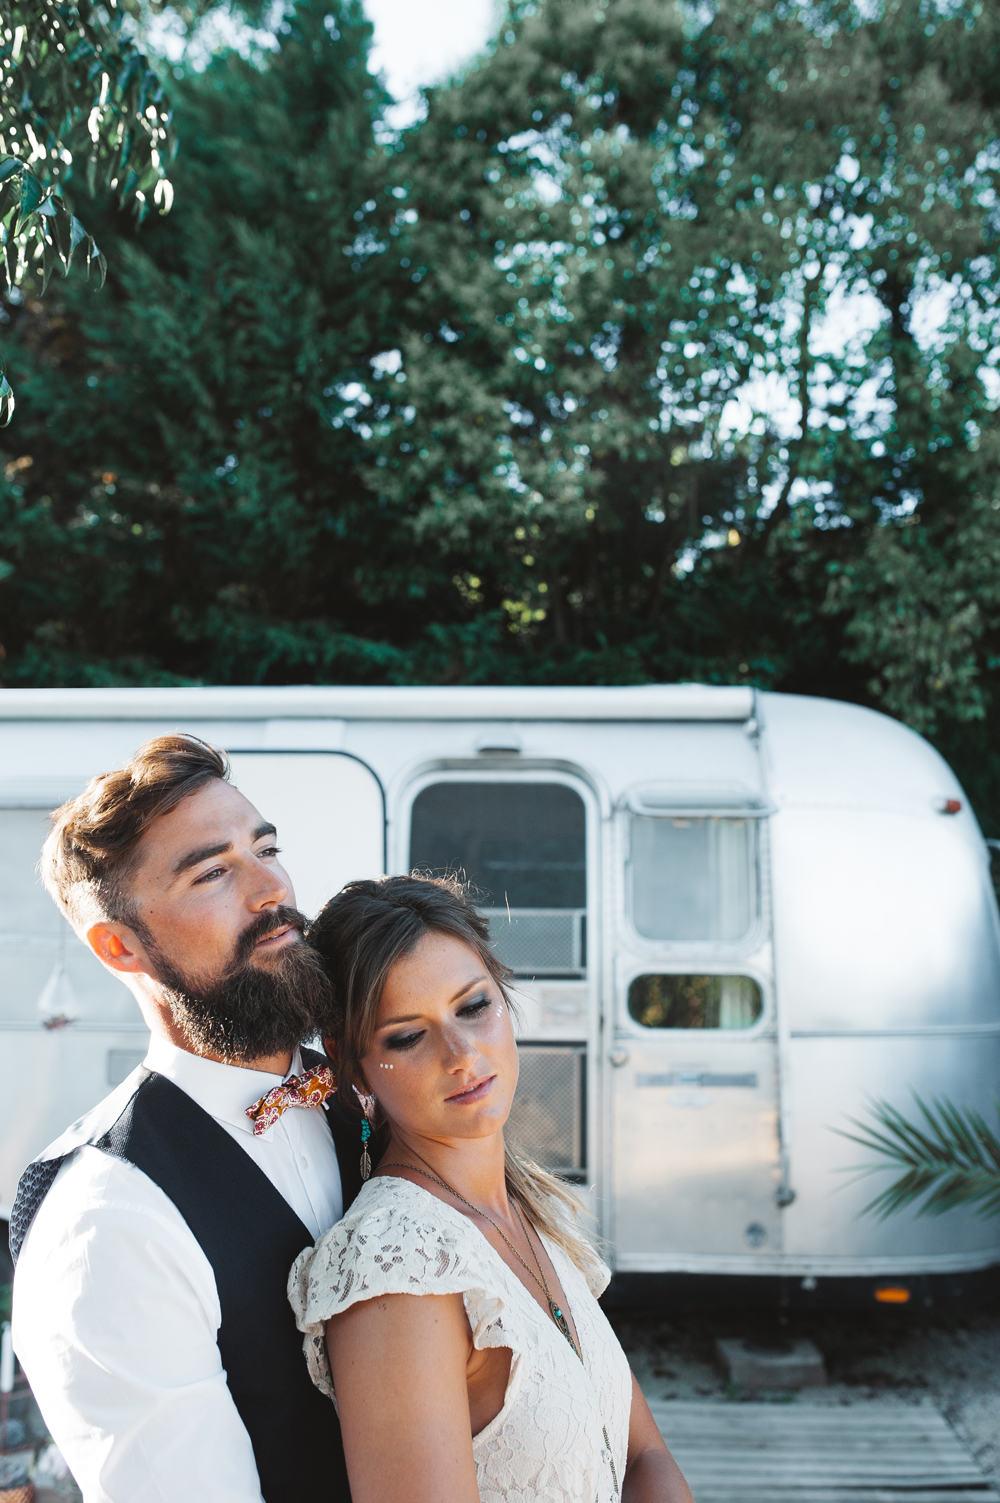 melanie-bultez-photographe-mariage-provence-wedding-photographer-aix-montpellier-folk-ethnique-42